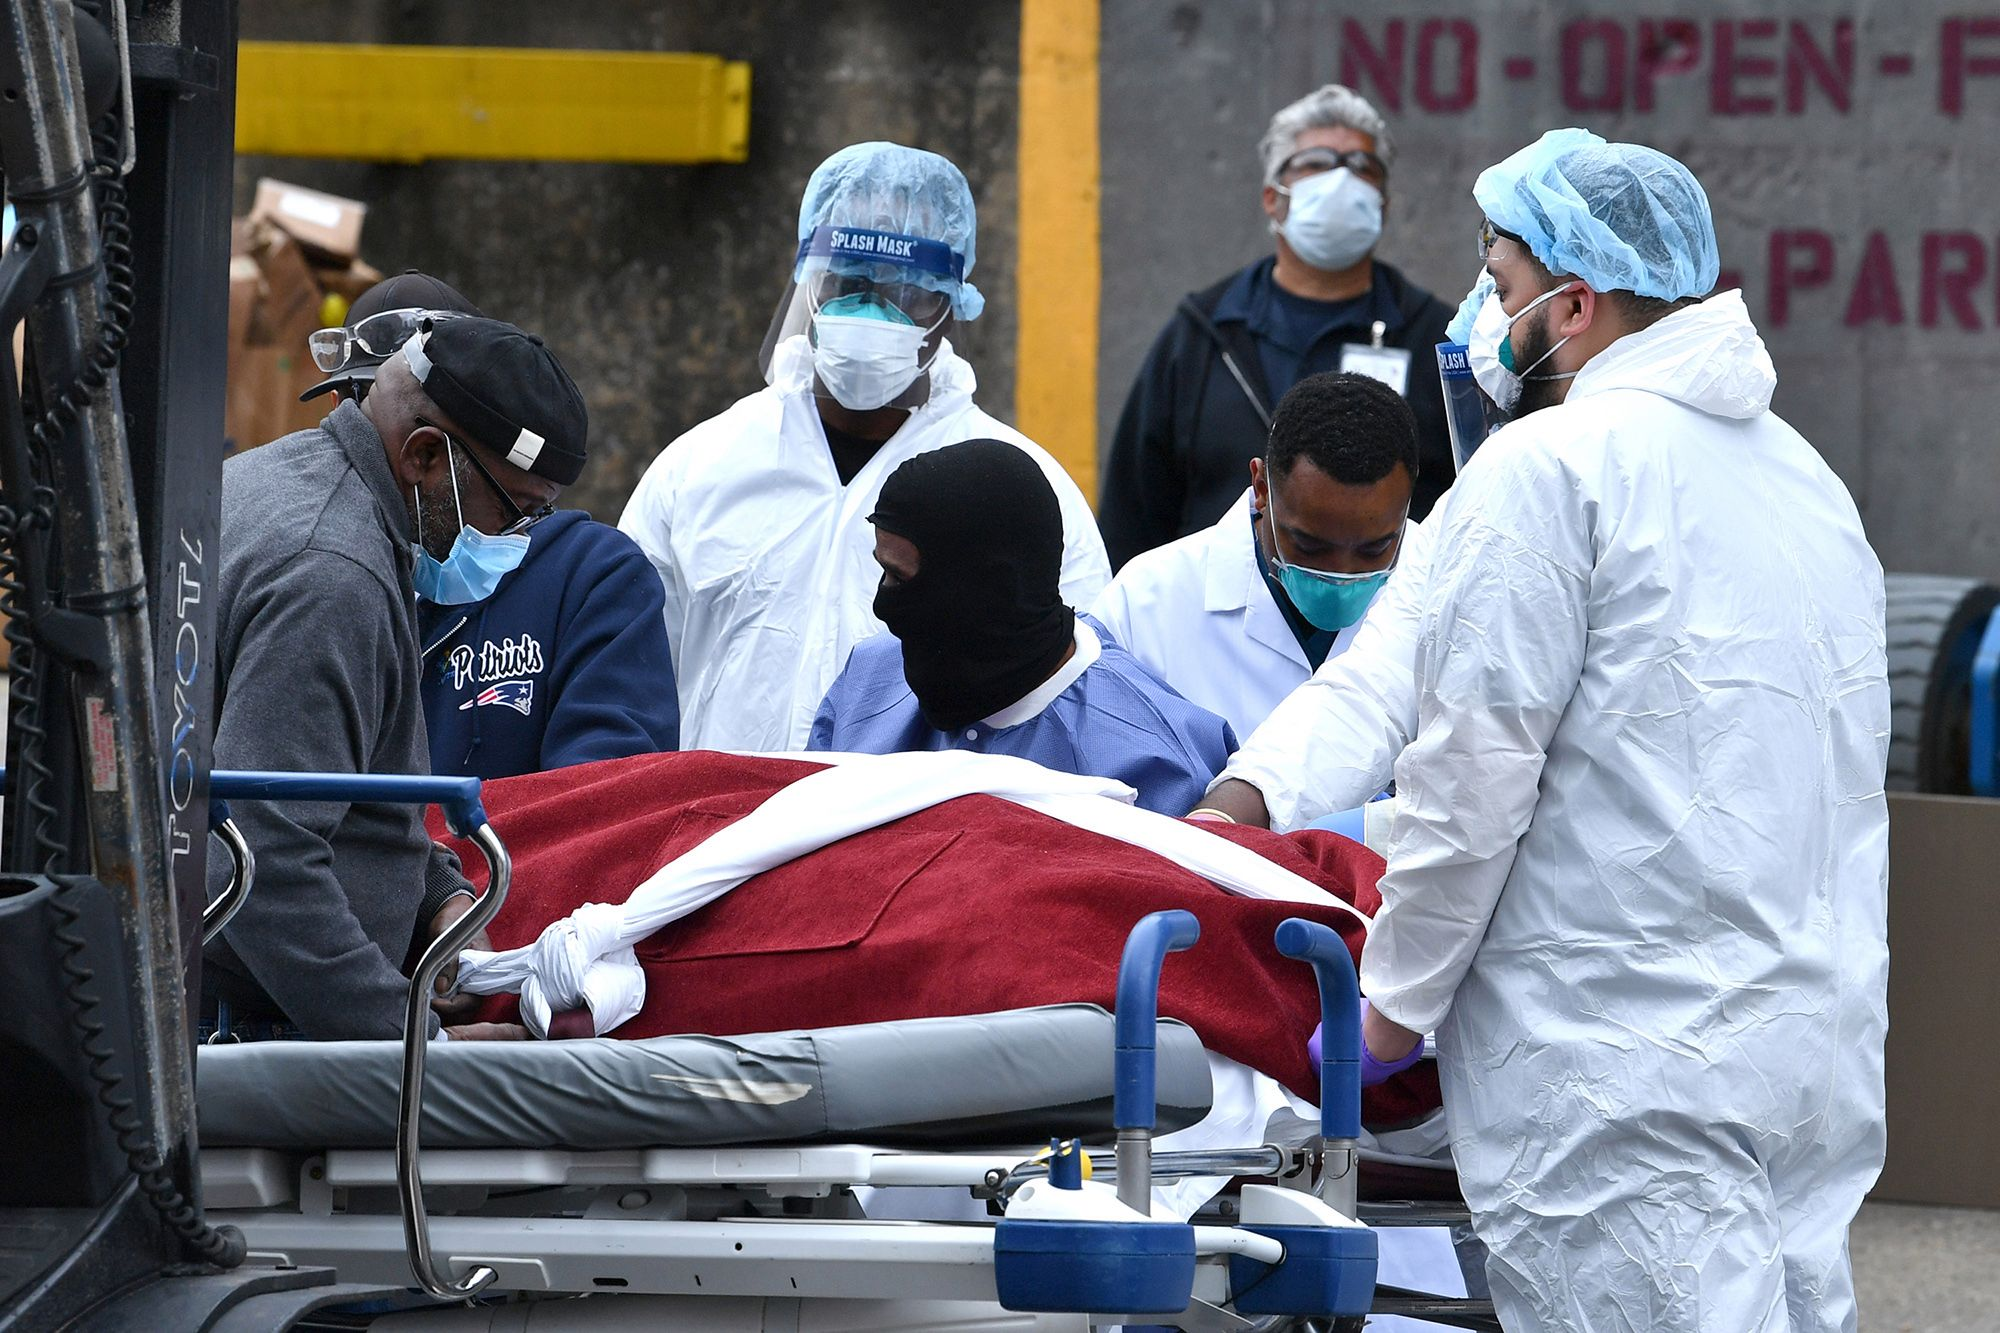 US records 1,150 coronavirus deaths in 24 hours: Johns Hopkins tracker